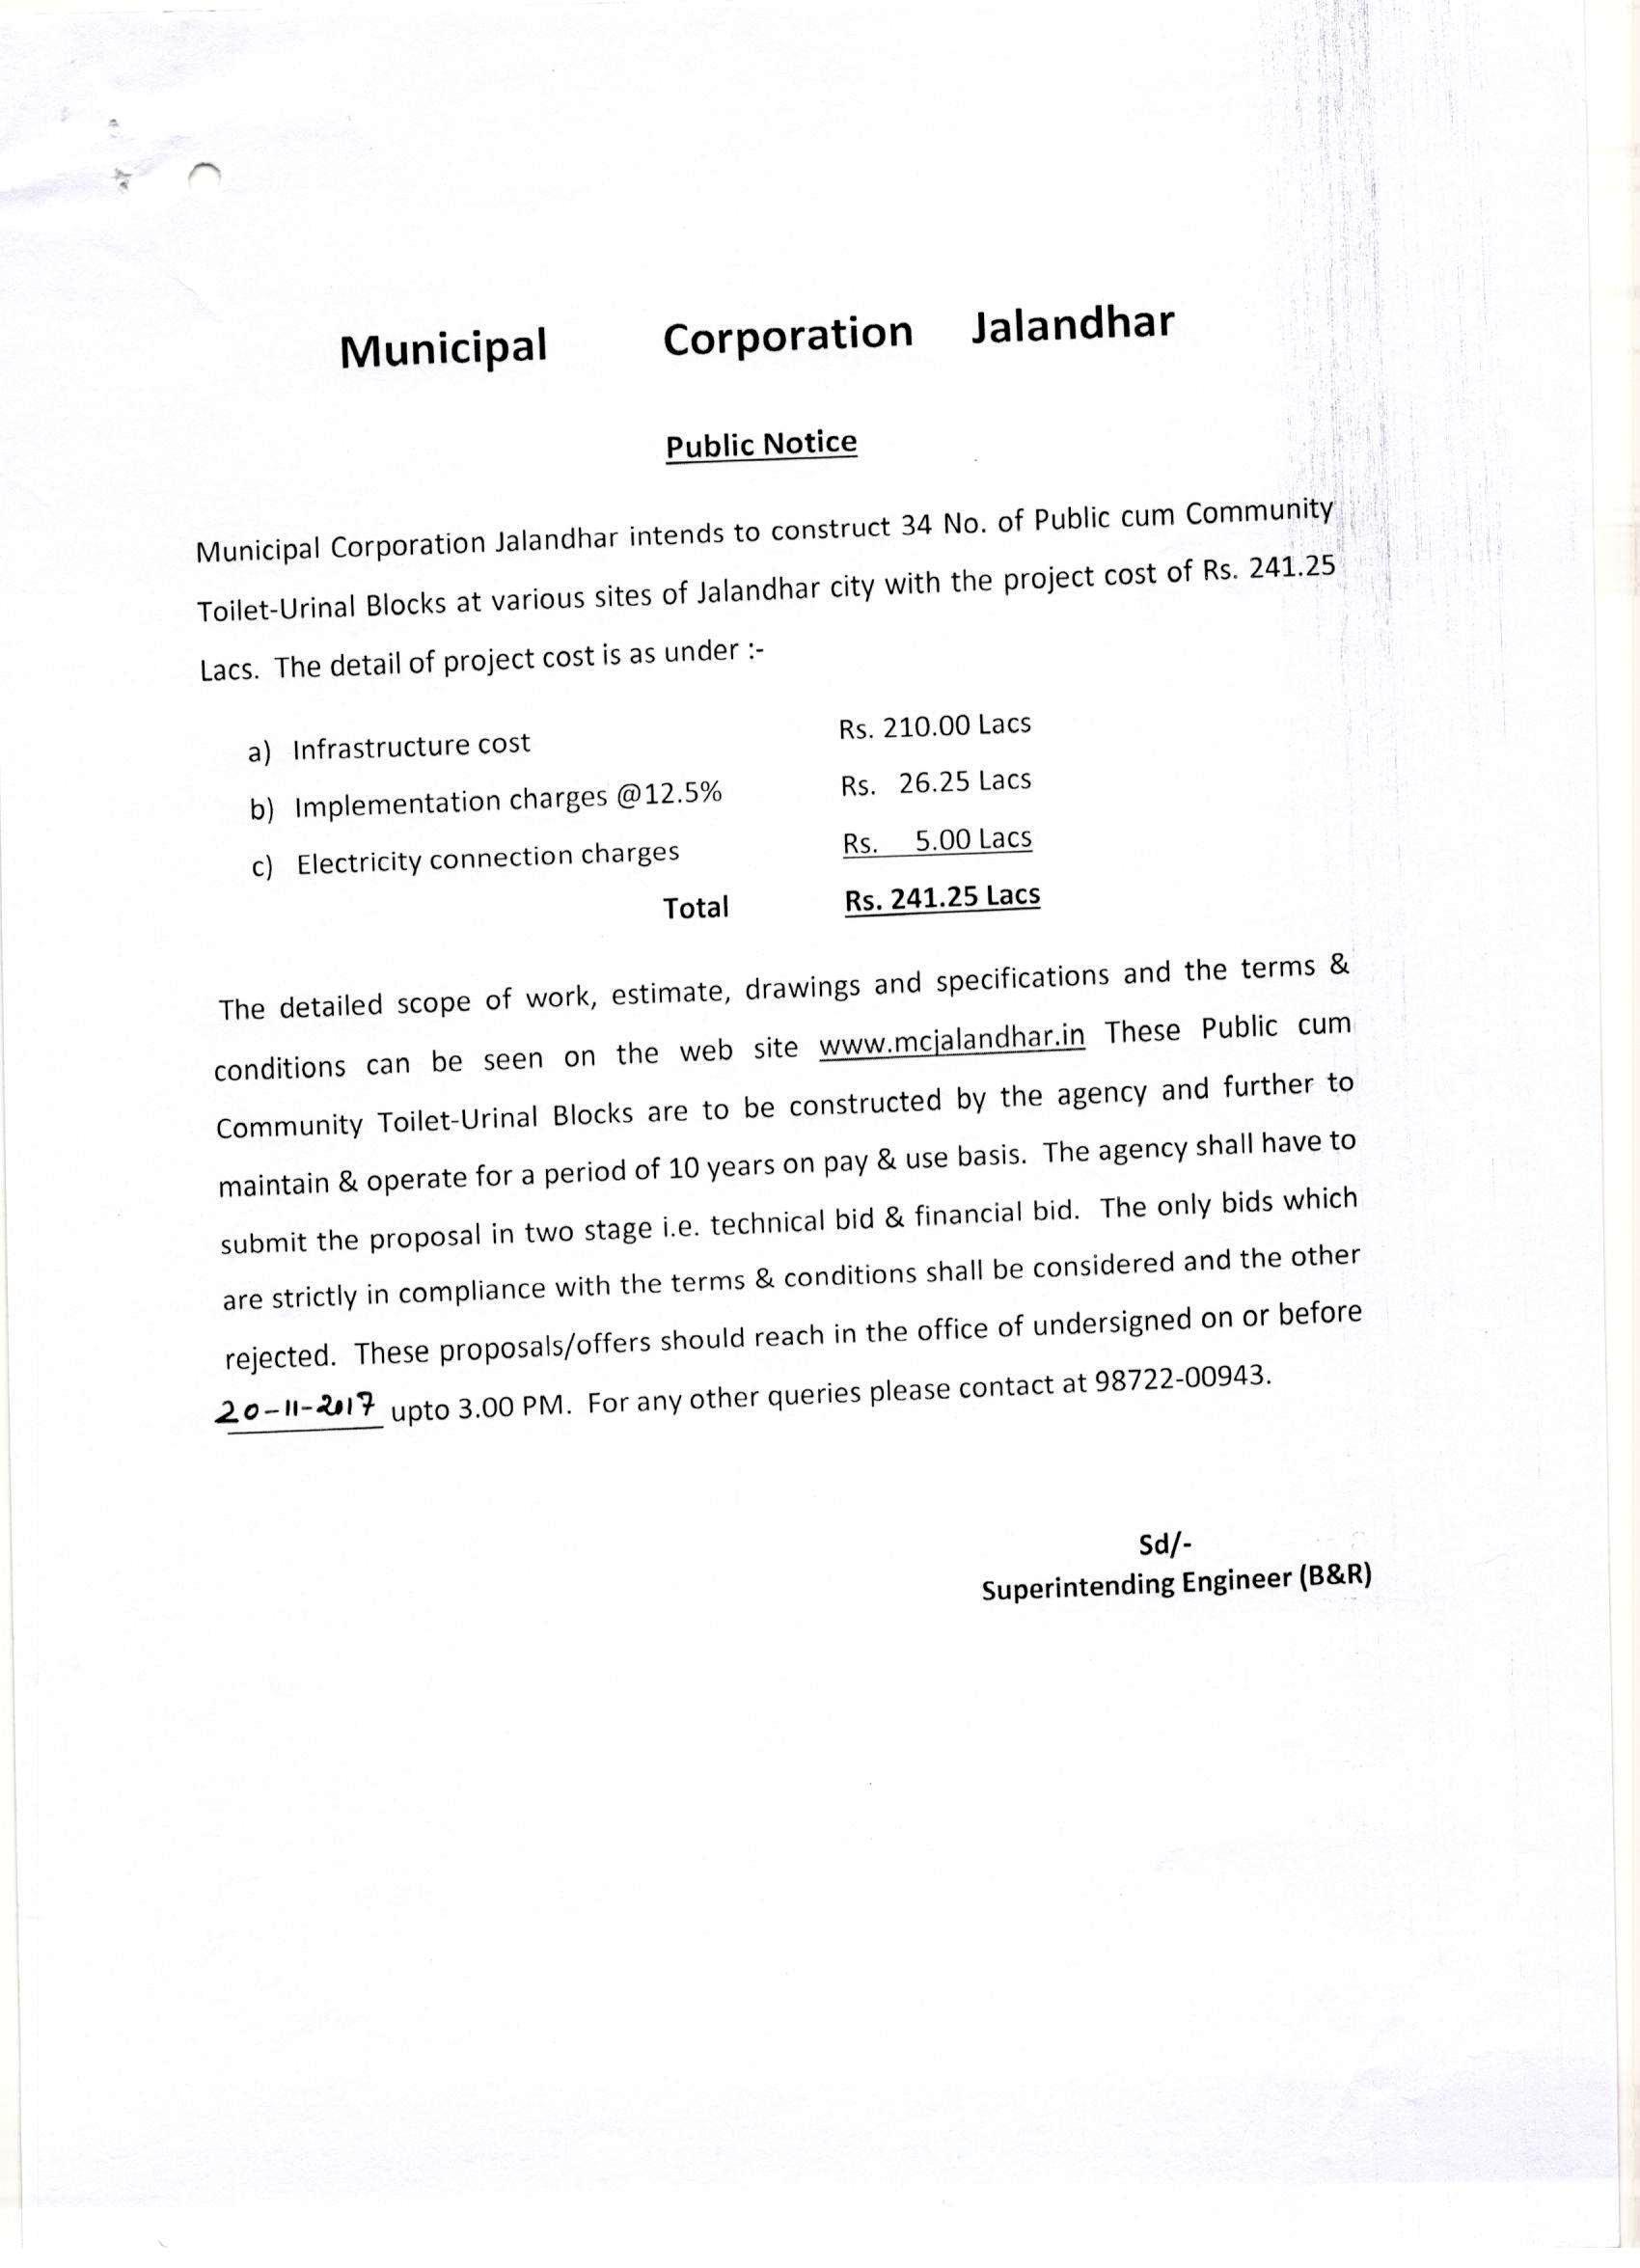 Muncipal corporation jalandhar public notice for tender spiritdancerdesigns Choice Image